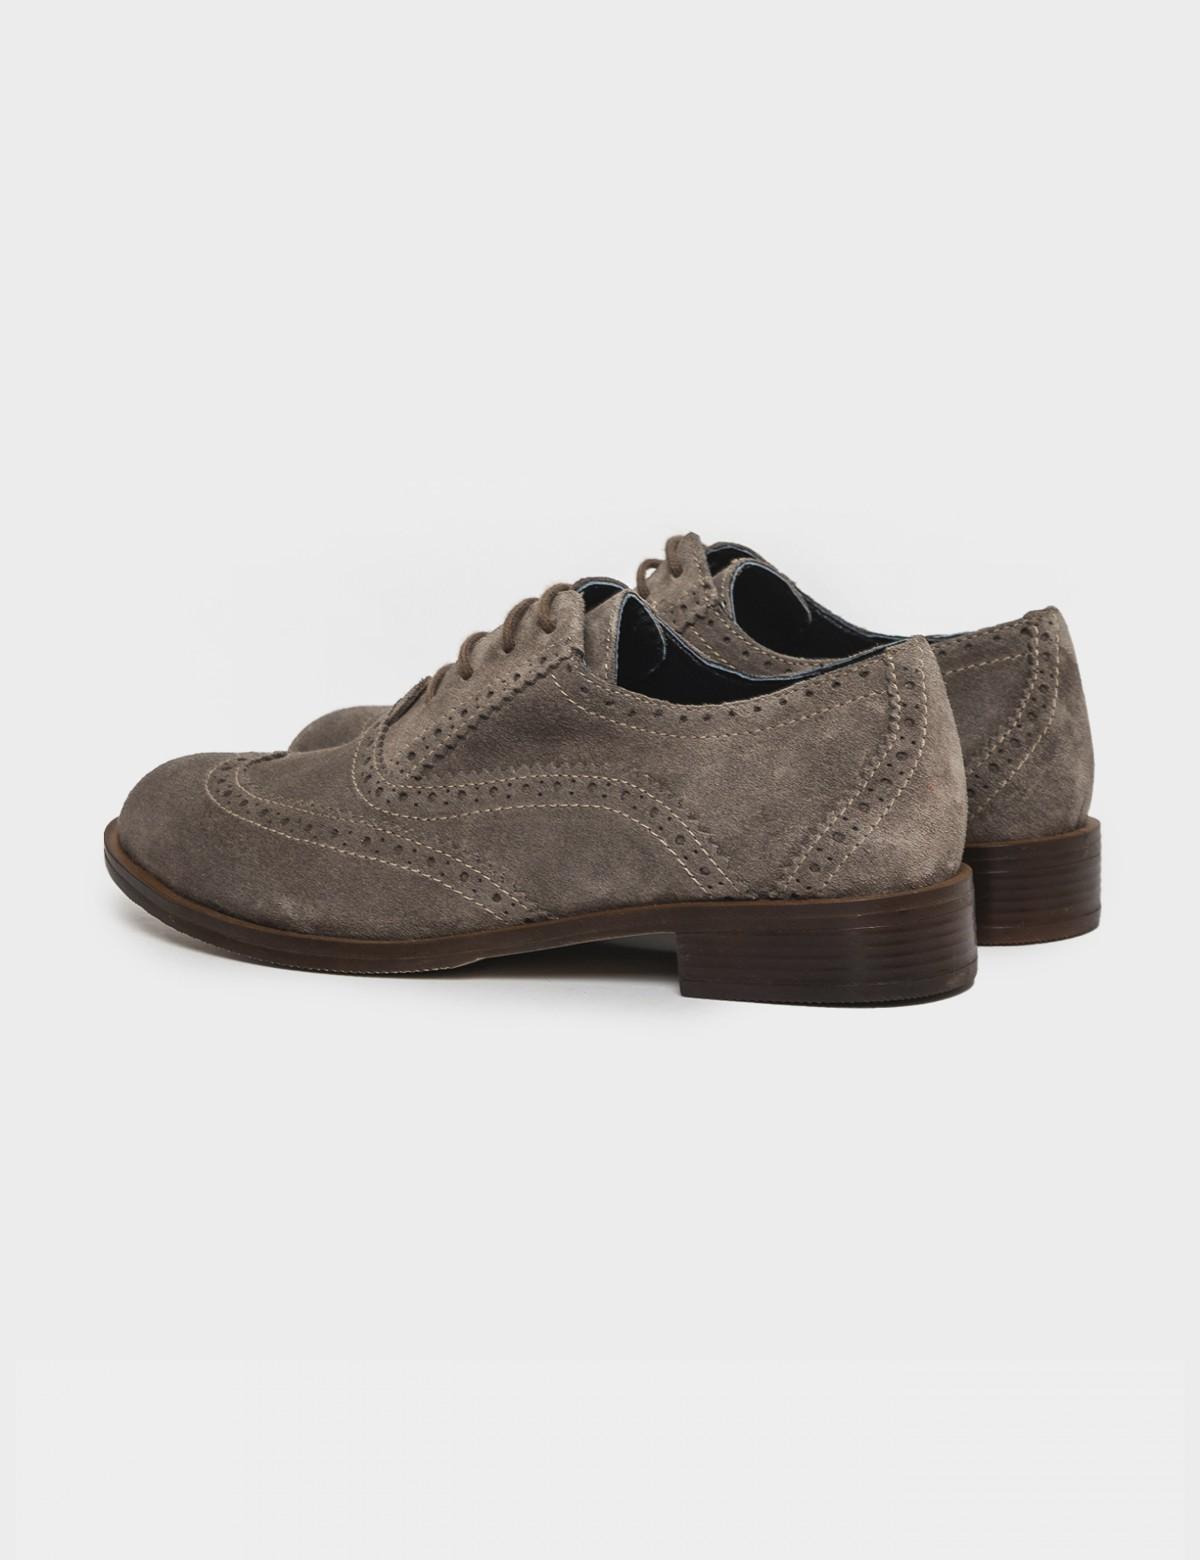 Туфли бежевые. Натуральная замша2